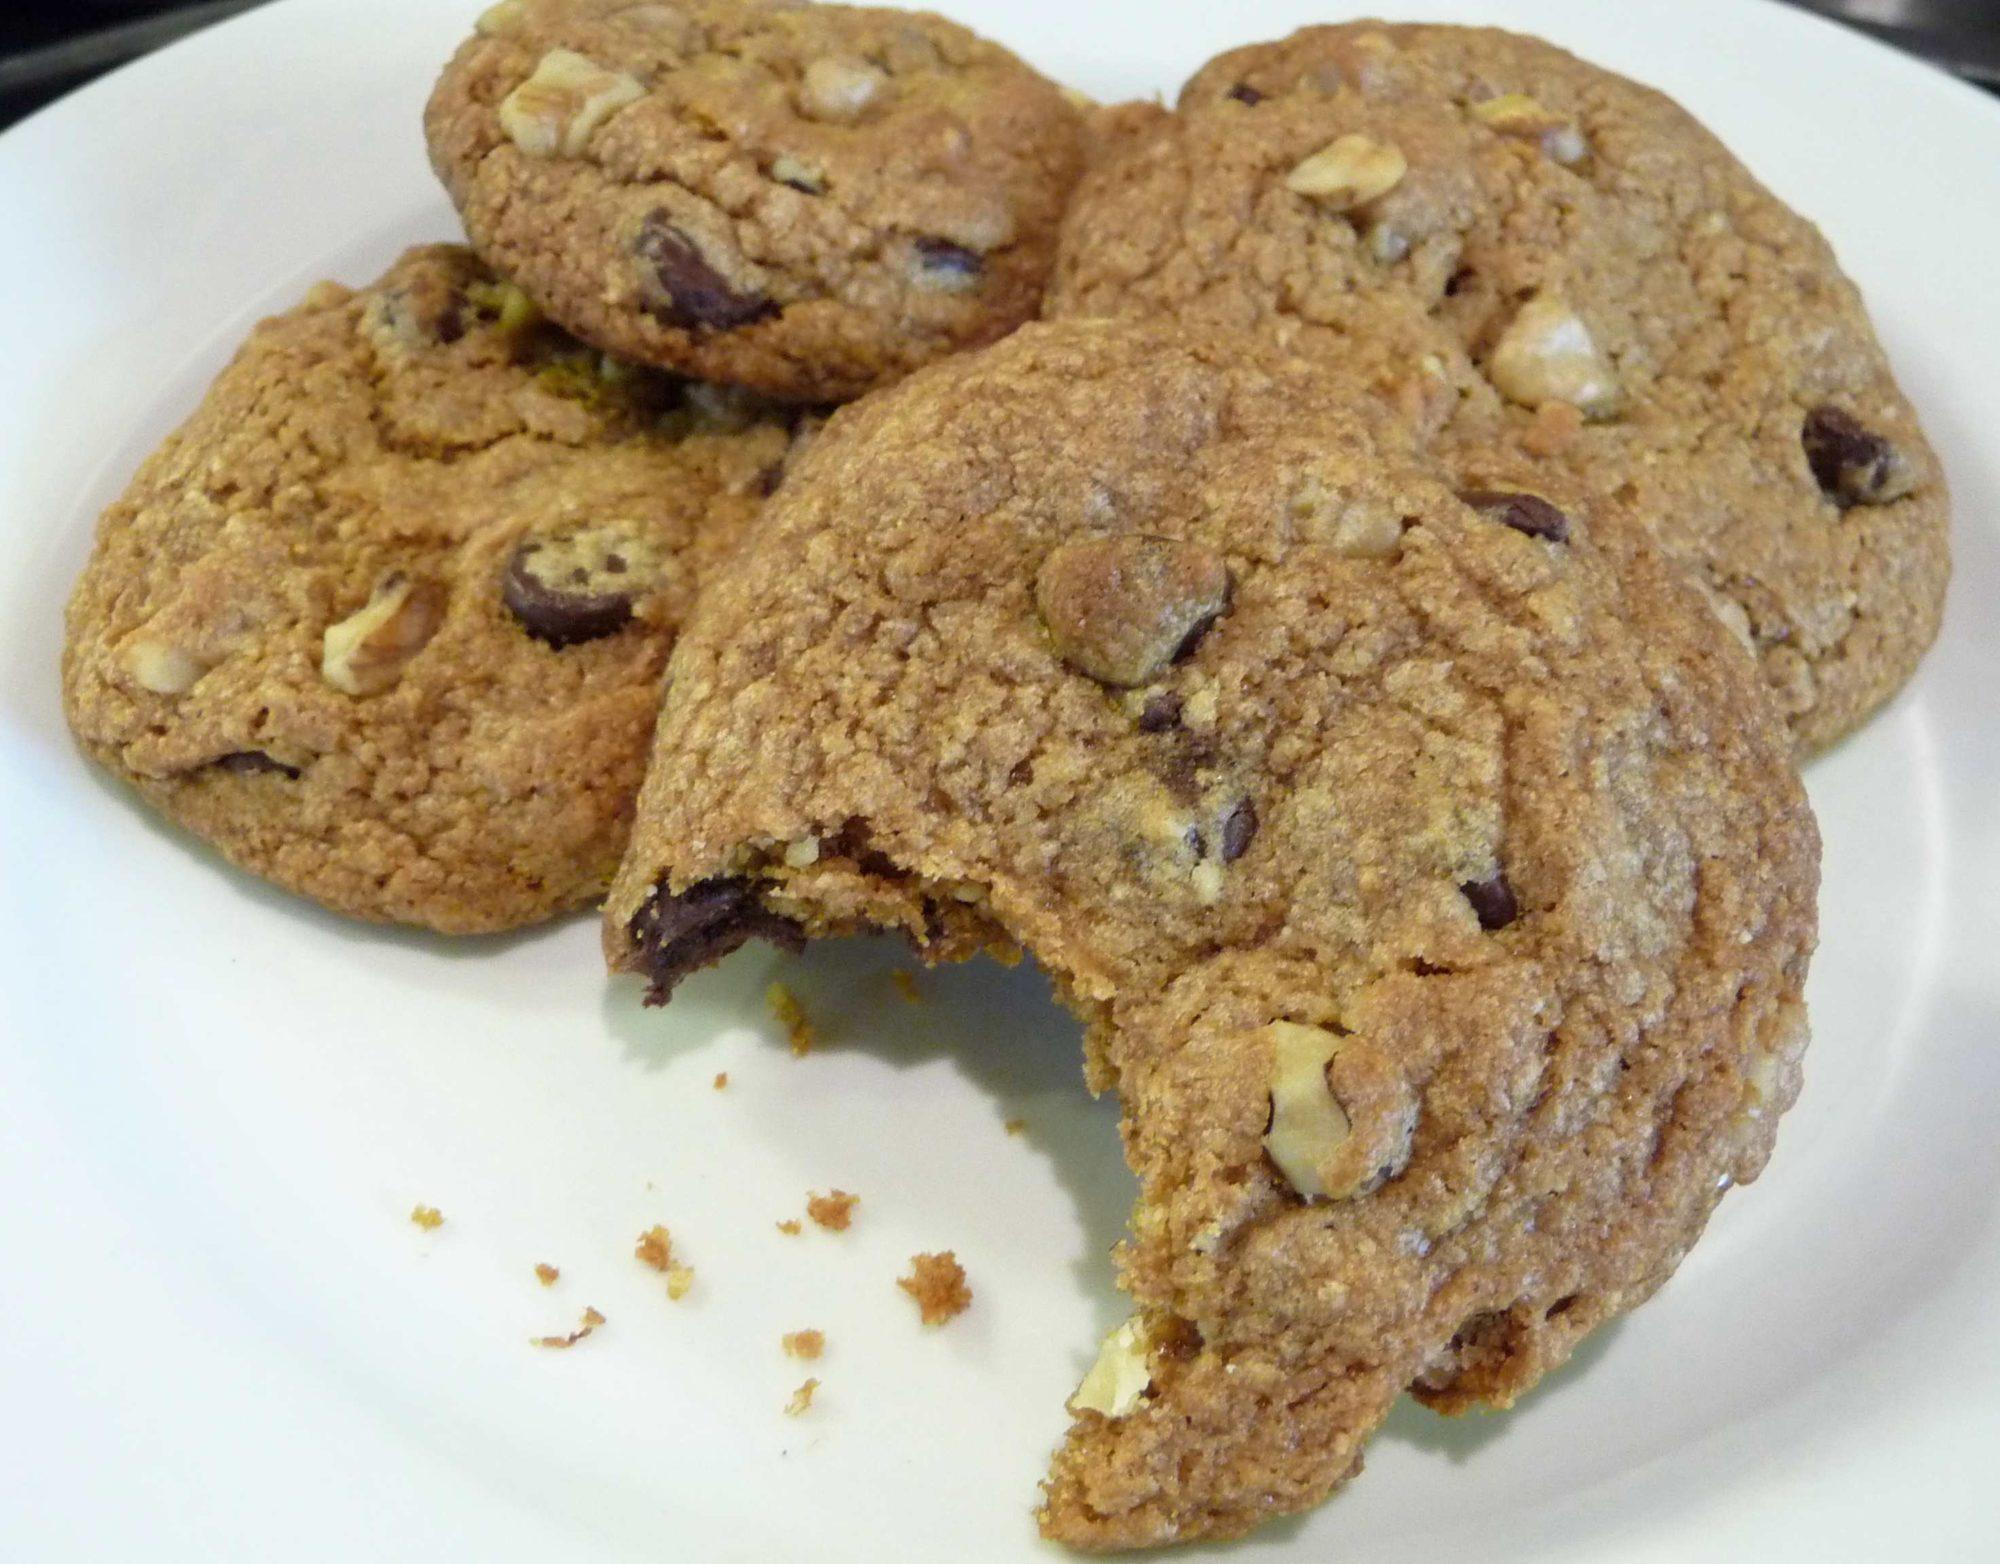 Gotta Love Chocolate Chip Cookies - The Nourishing Home